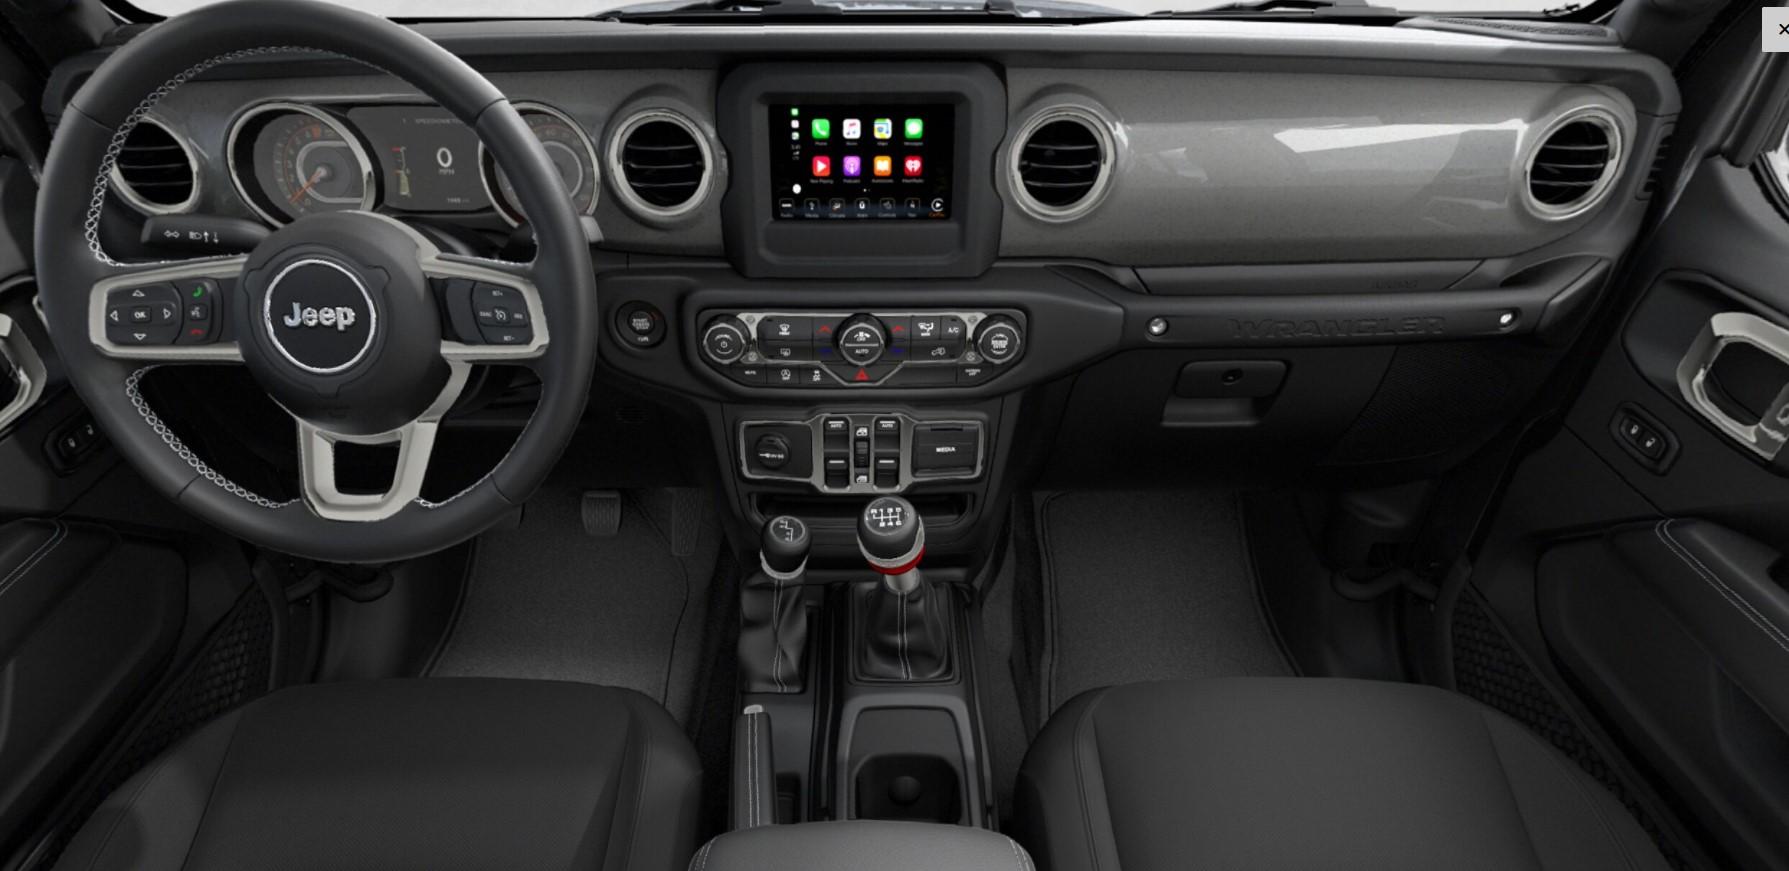 2018 Jeep Wrangler JL Unlimited Sahara Gray Interior